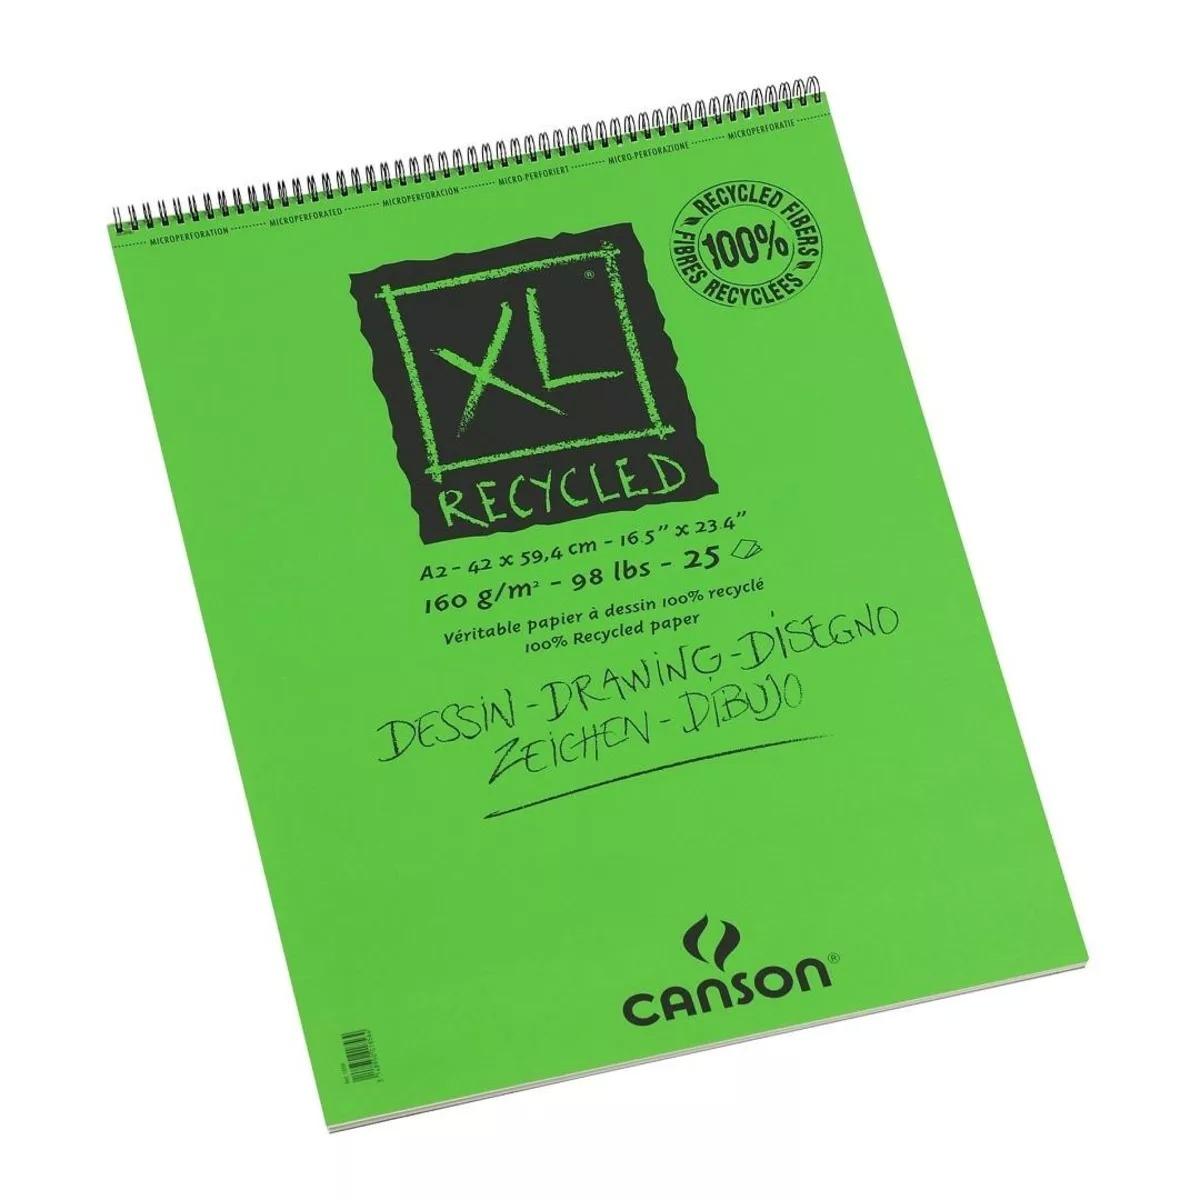 Купить Альбом для графики на спирали Canson XL Recycled 42х59, 4 см 25 л 160 г, Франция